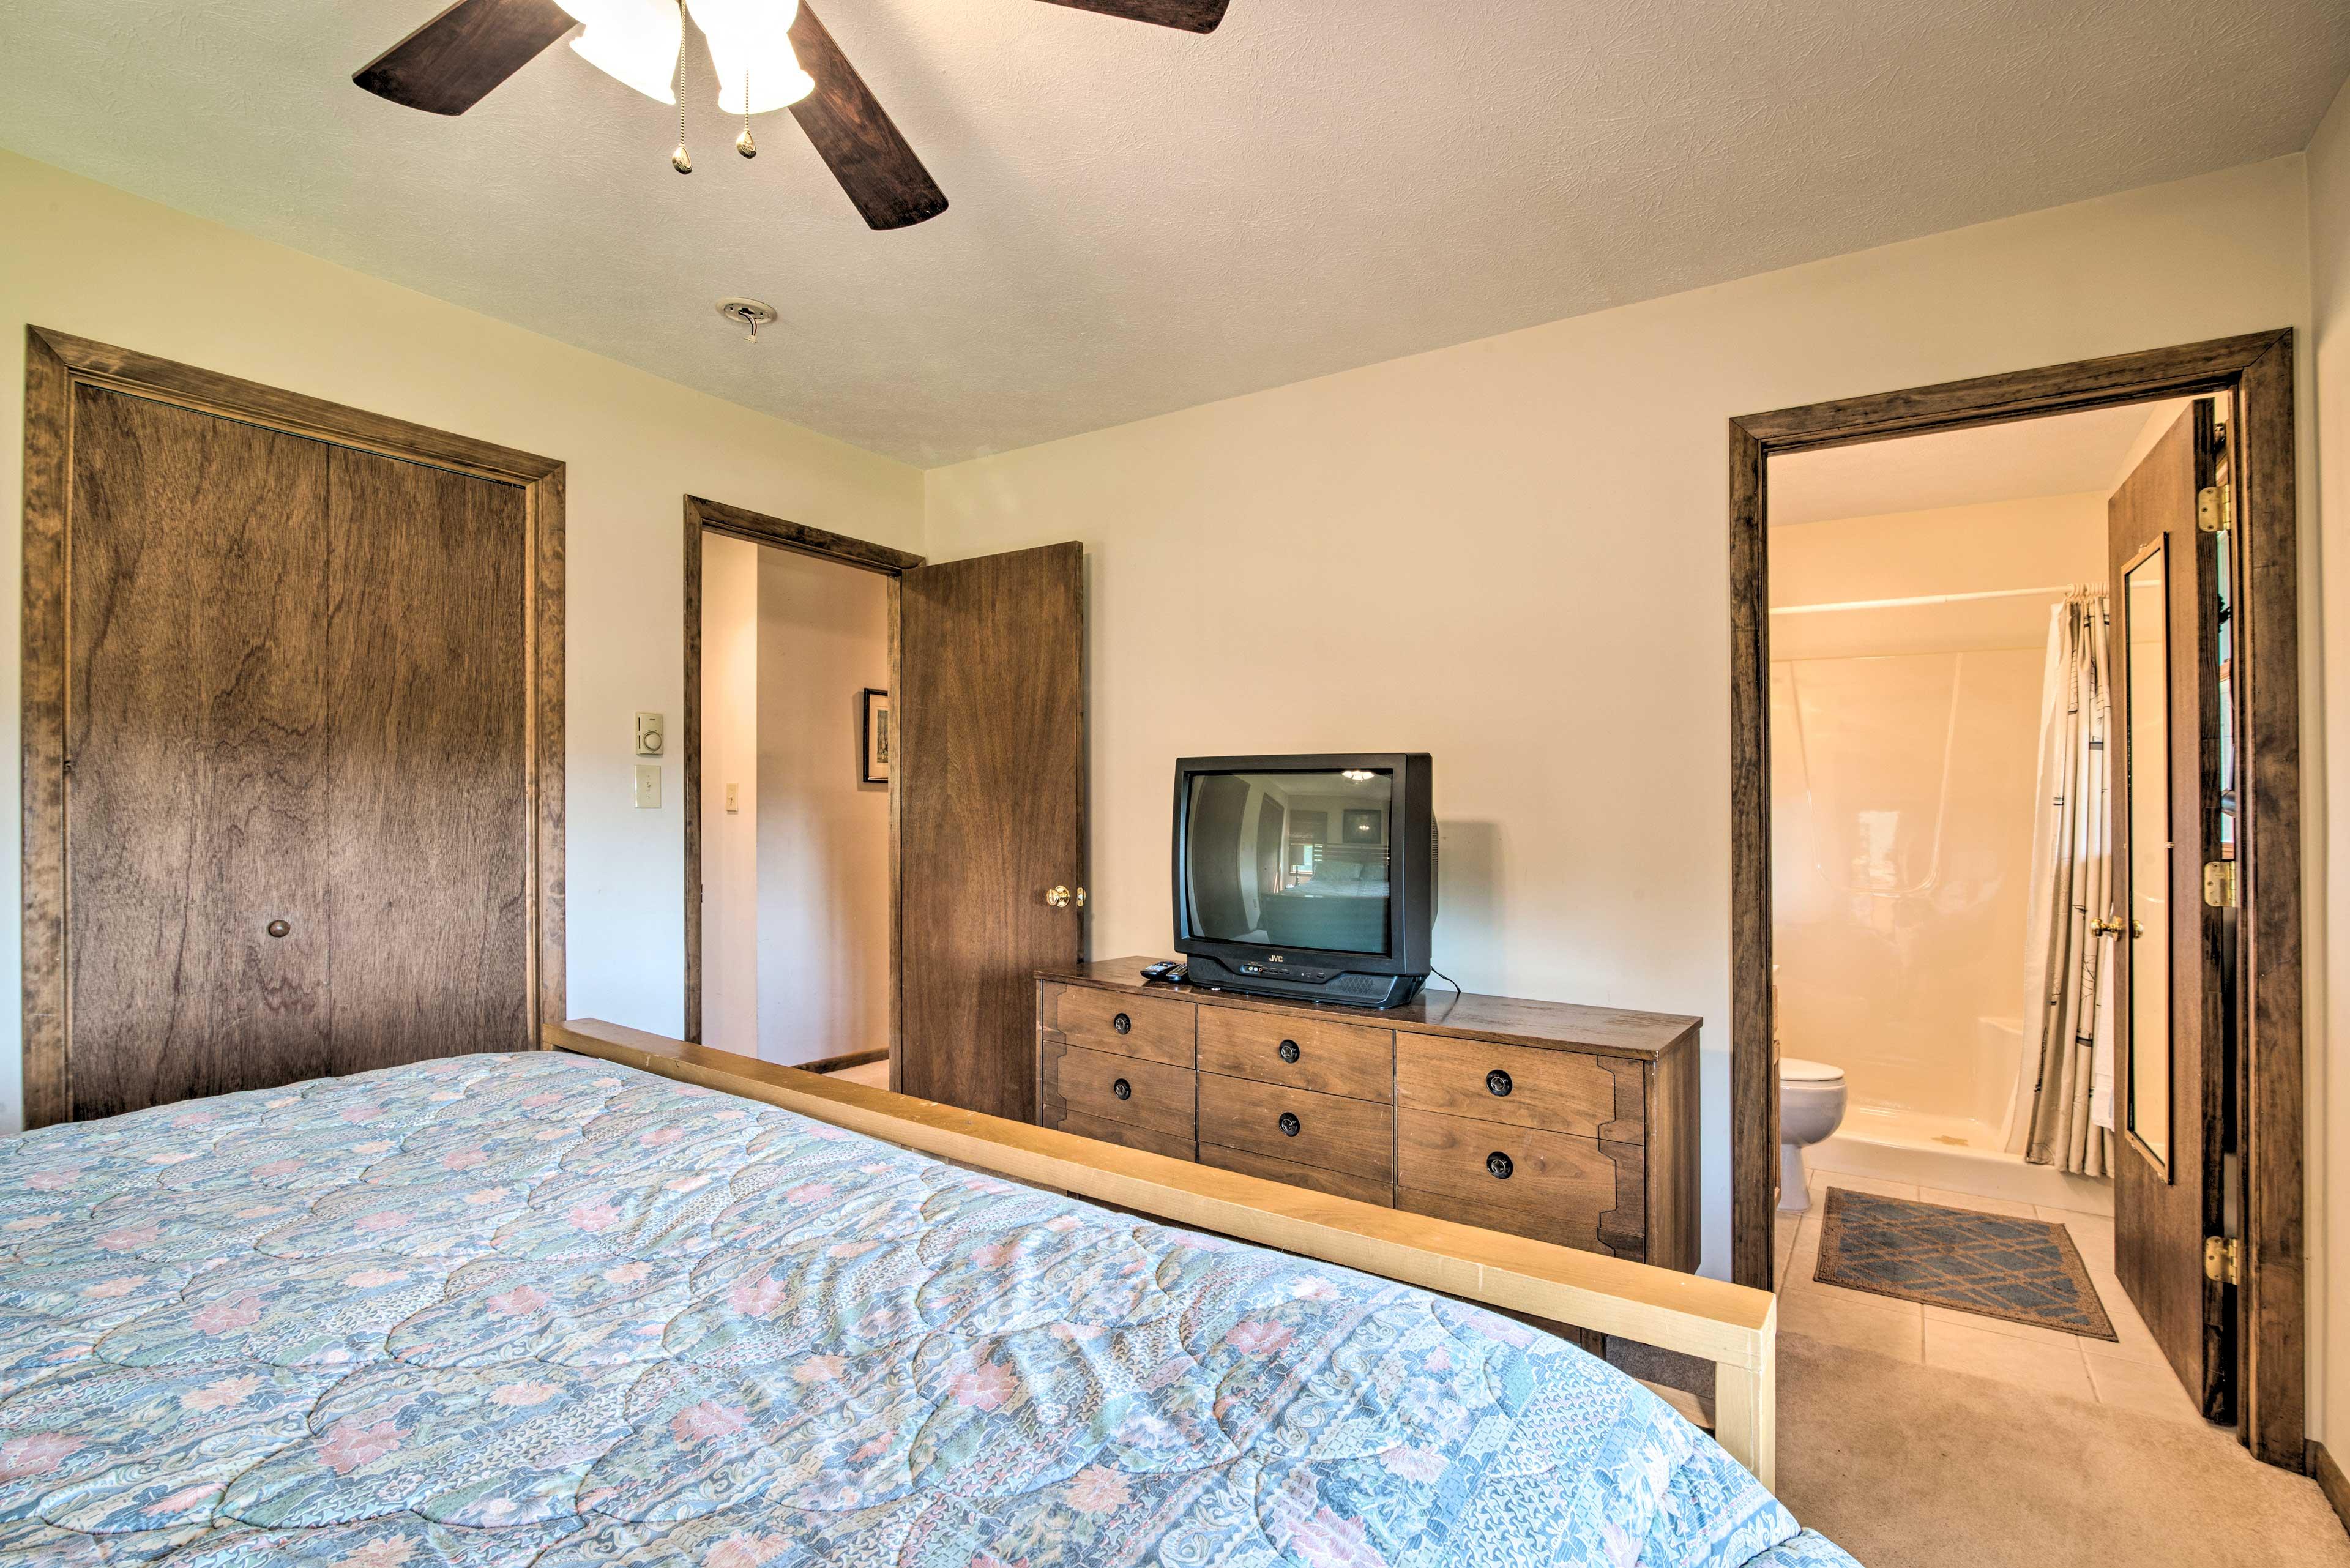 The master bedroom sleeps 2 and has an en-suite bathroom.